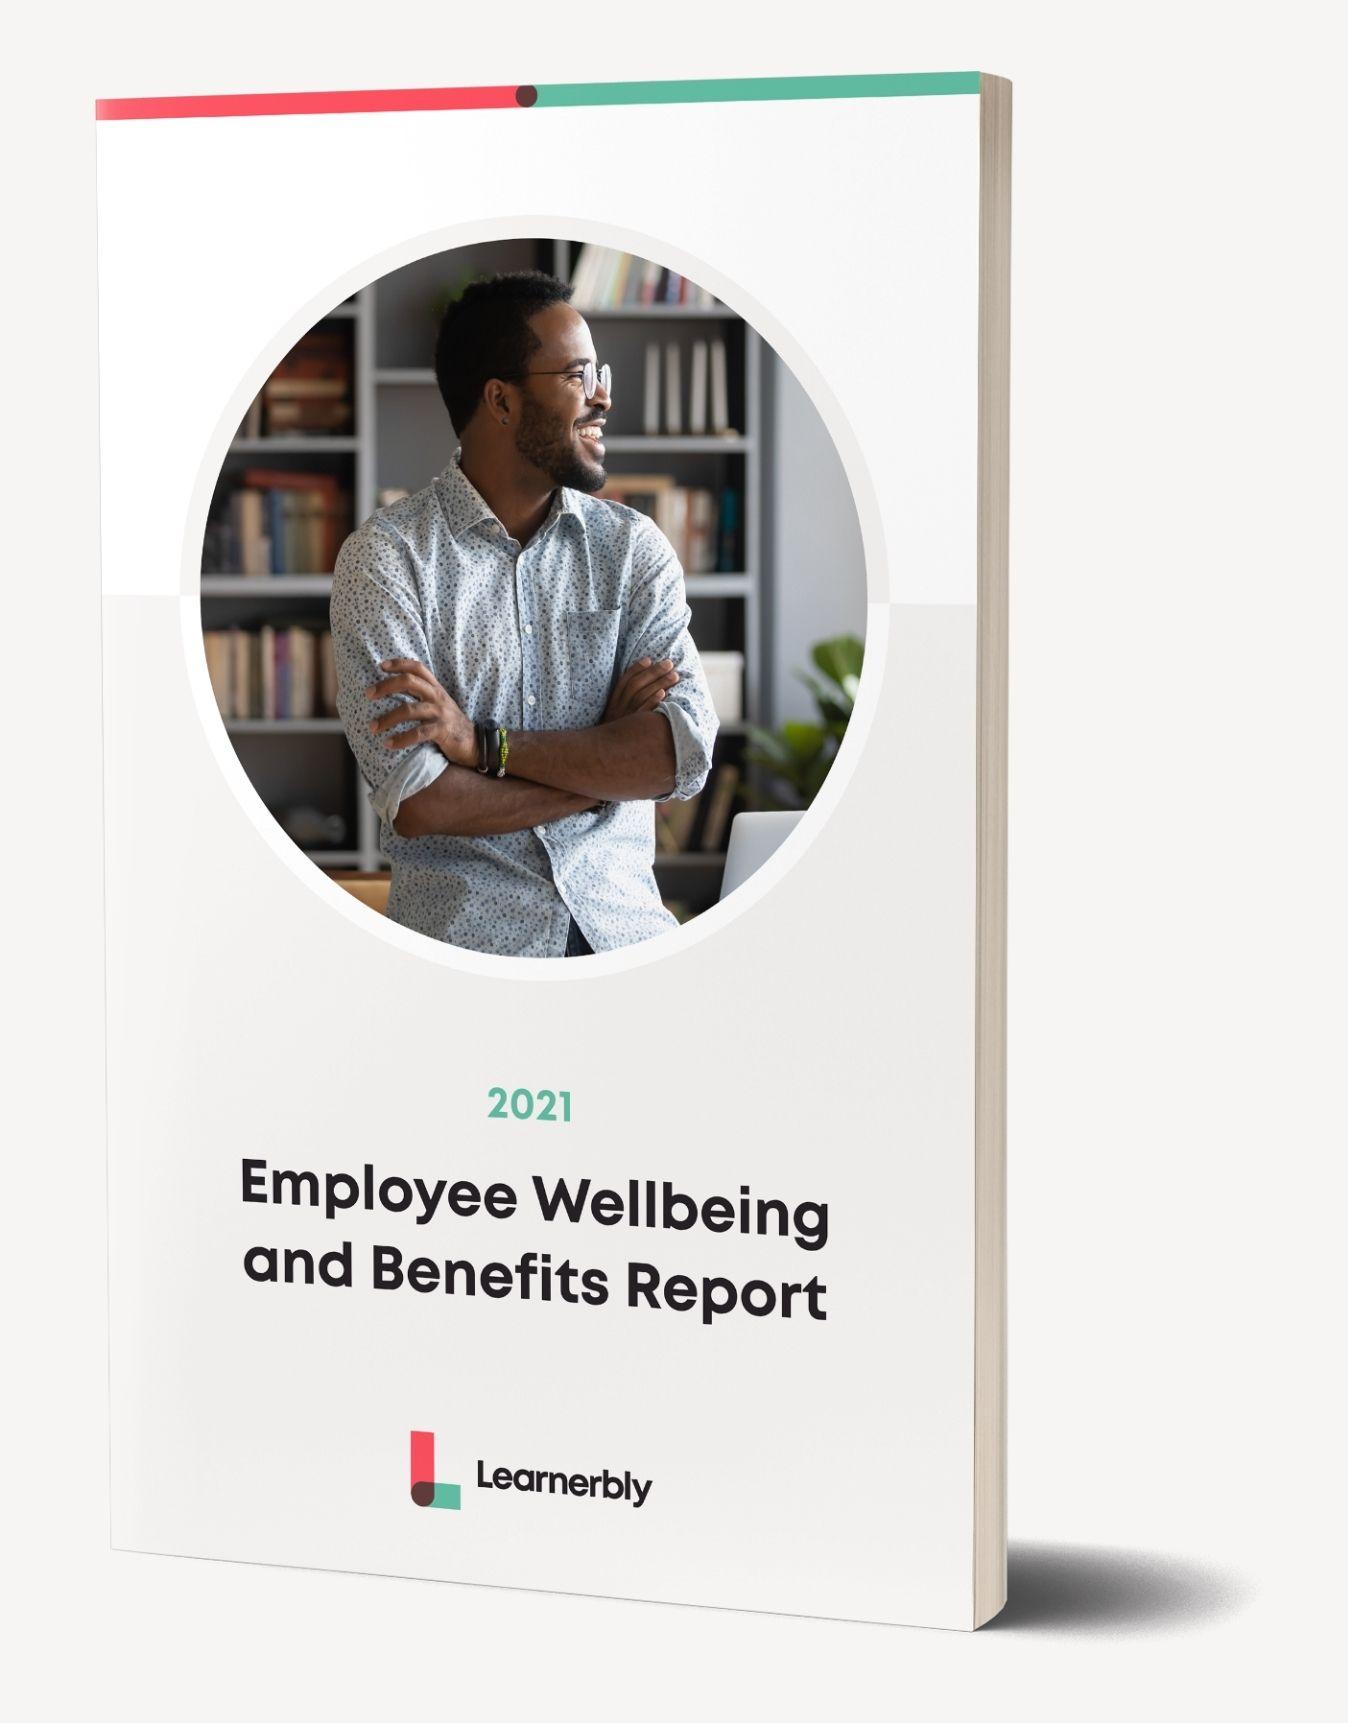 Learnerbly_2021EWAB_Report_Cover_Mockup_2